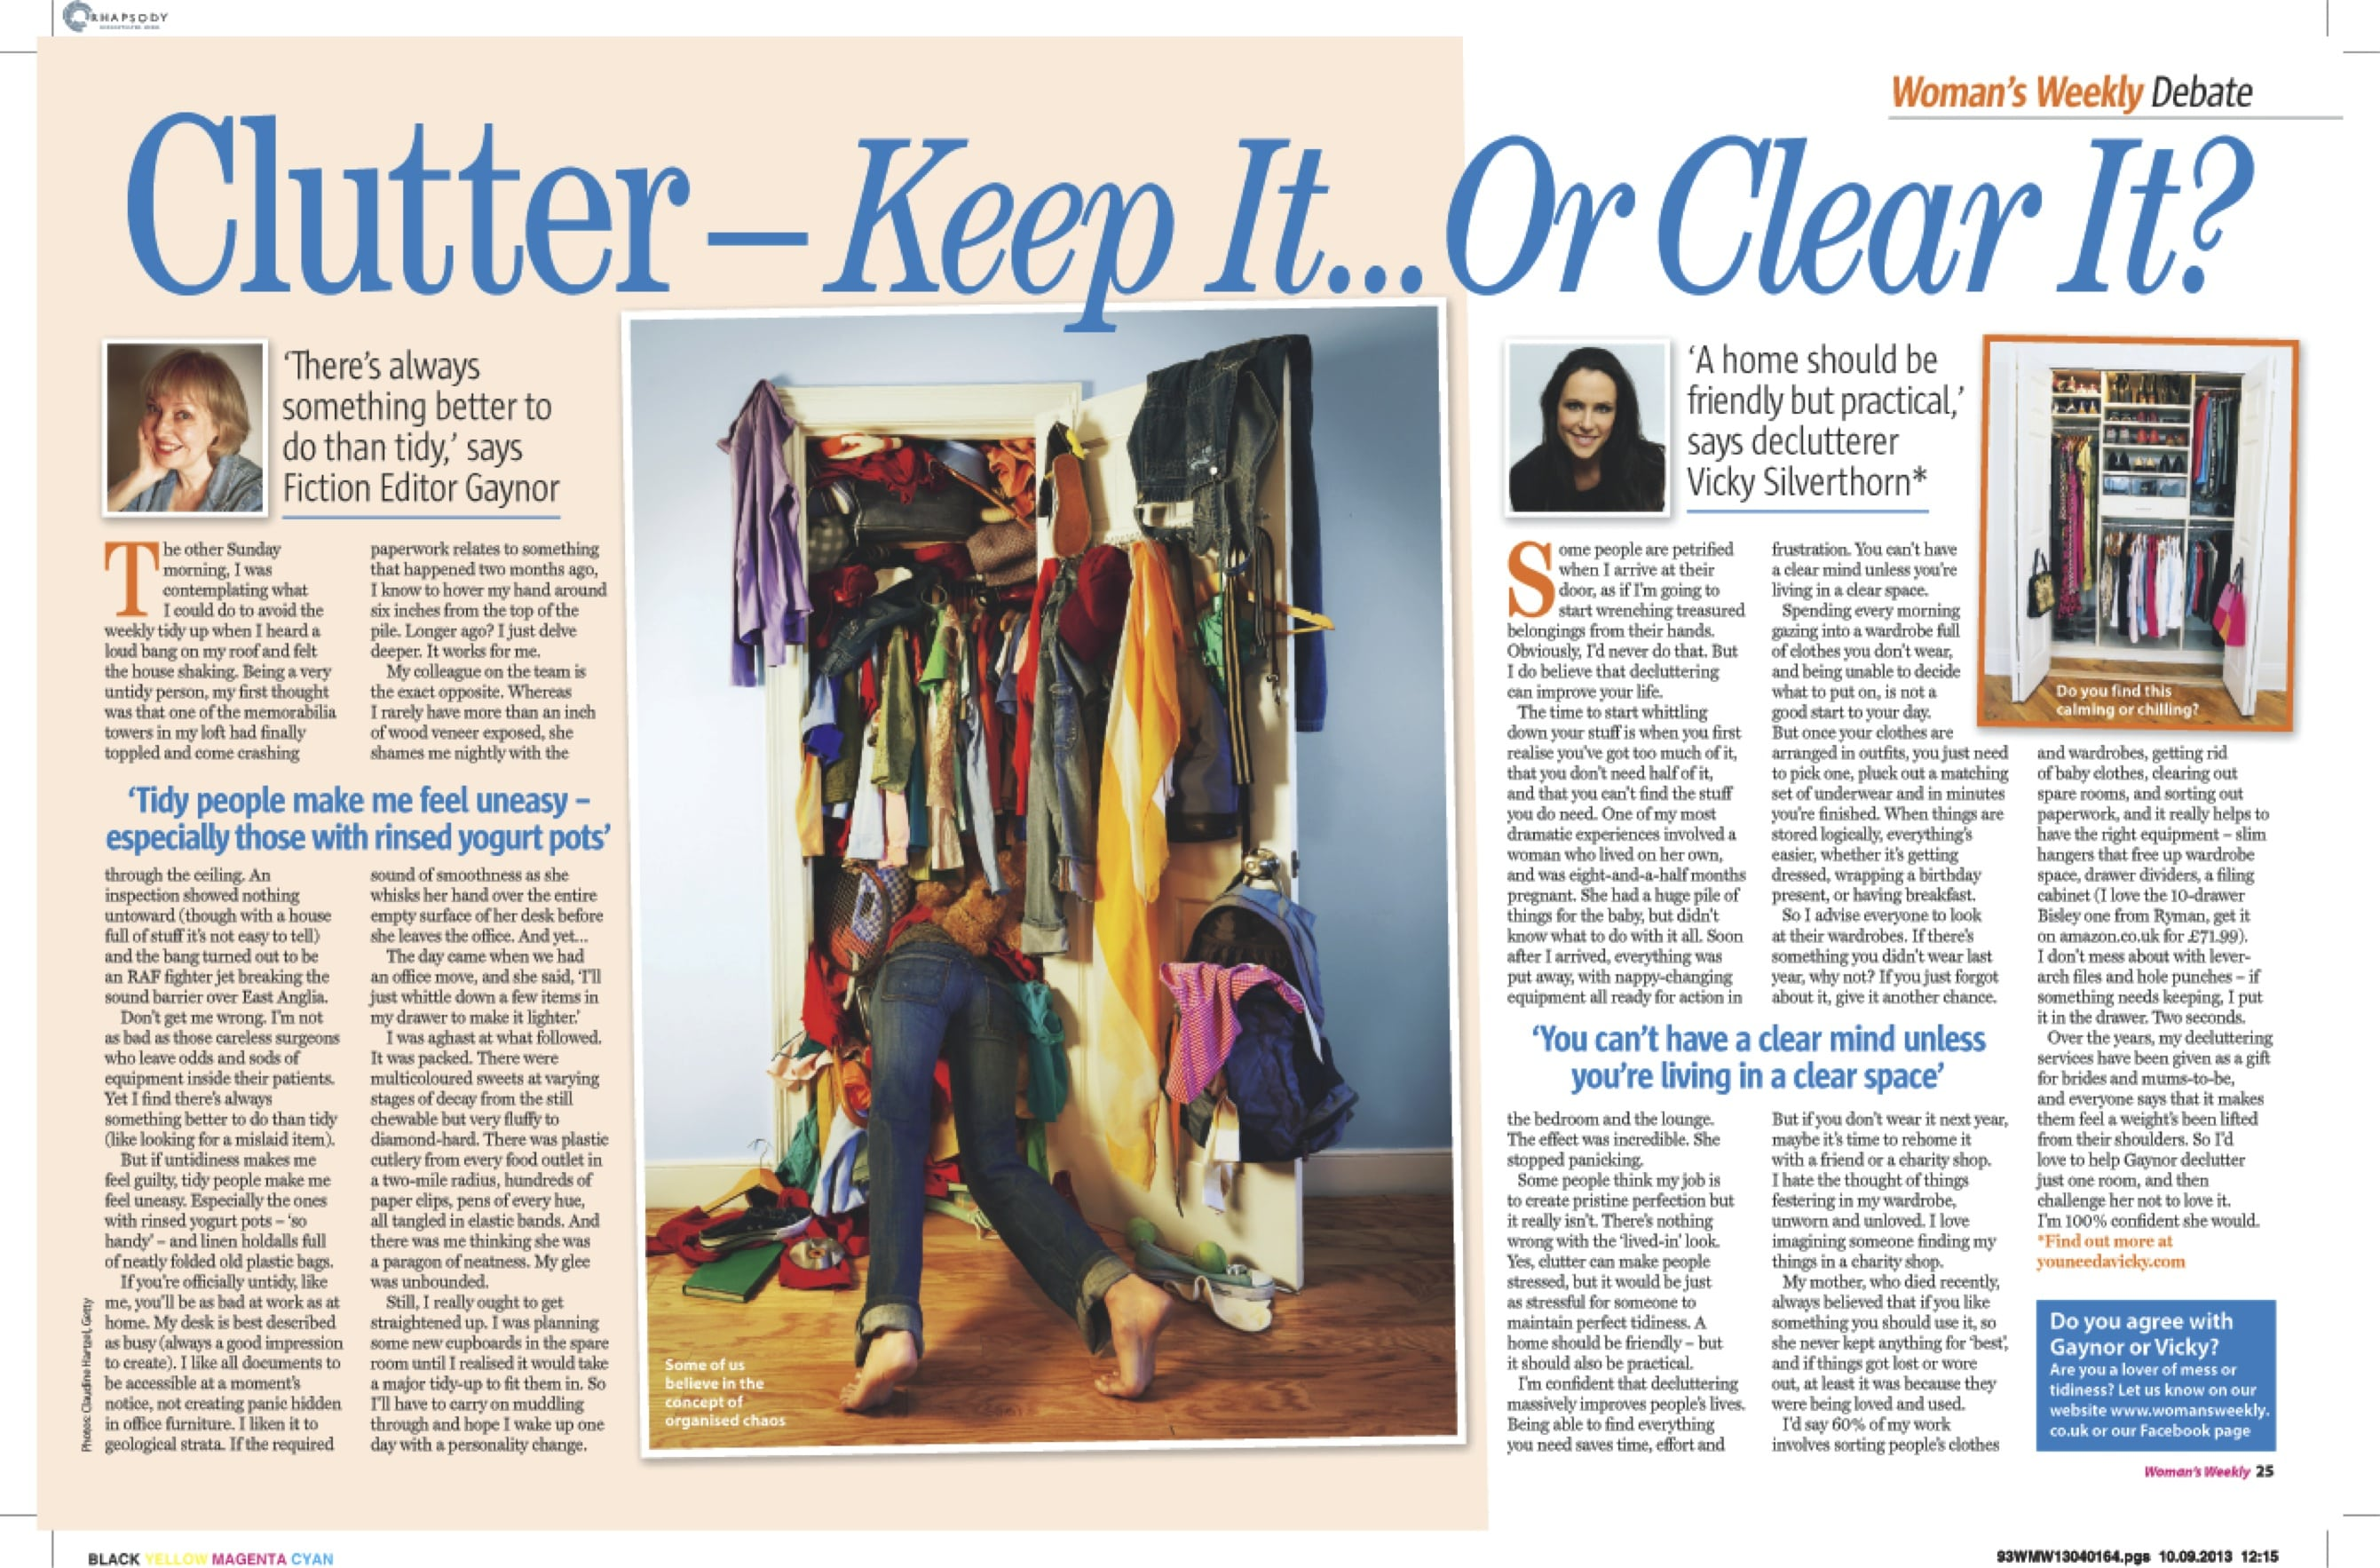 Clutter debate (1 Oct)